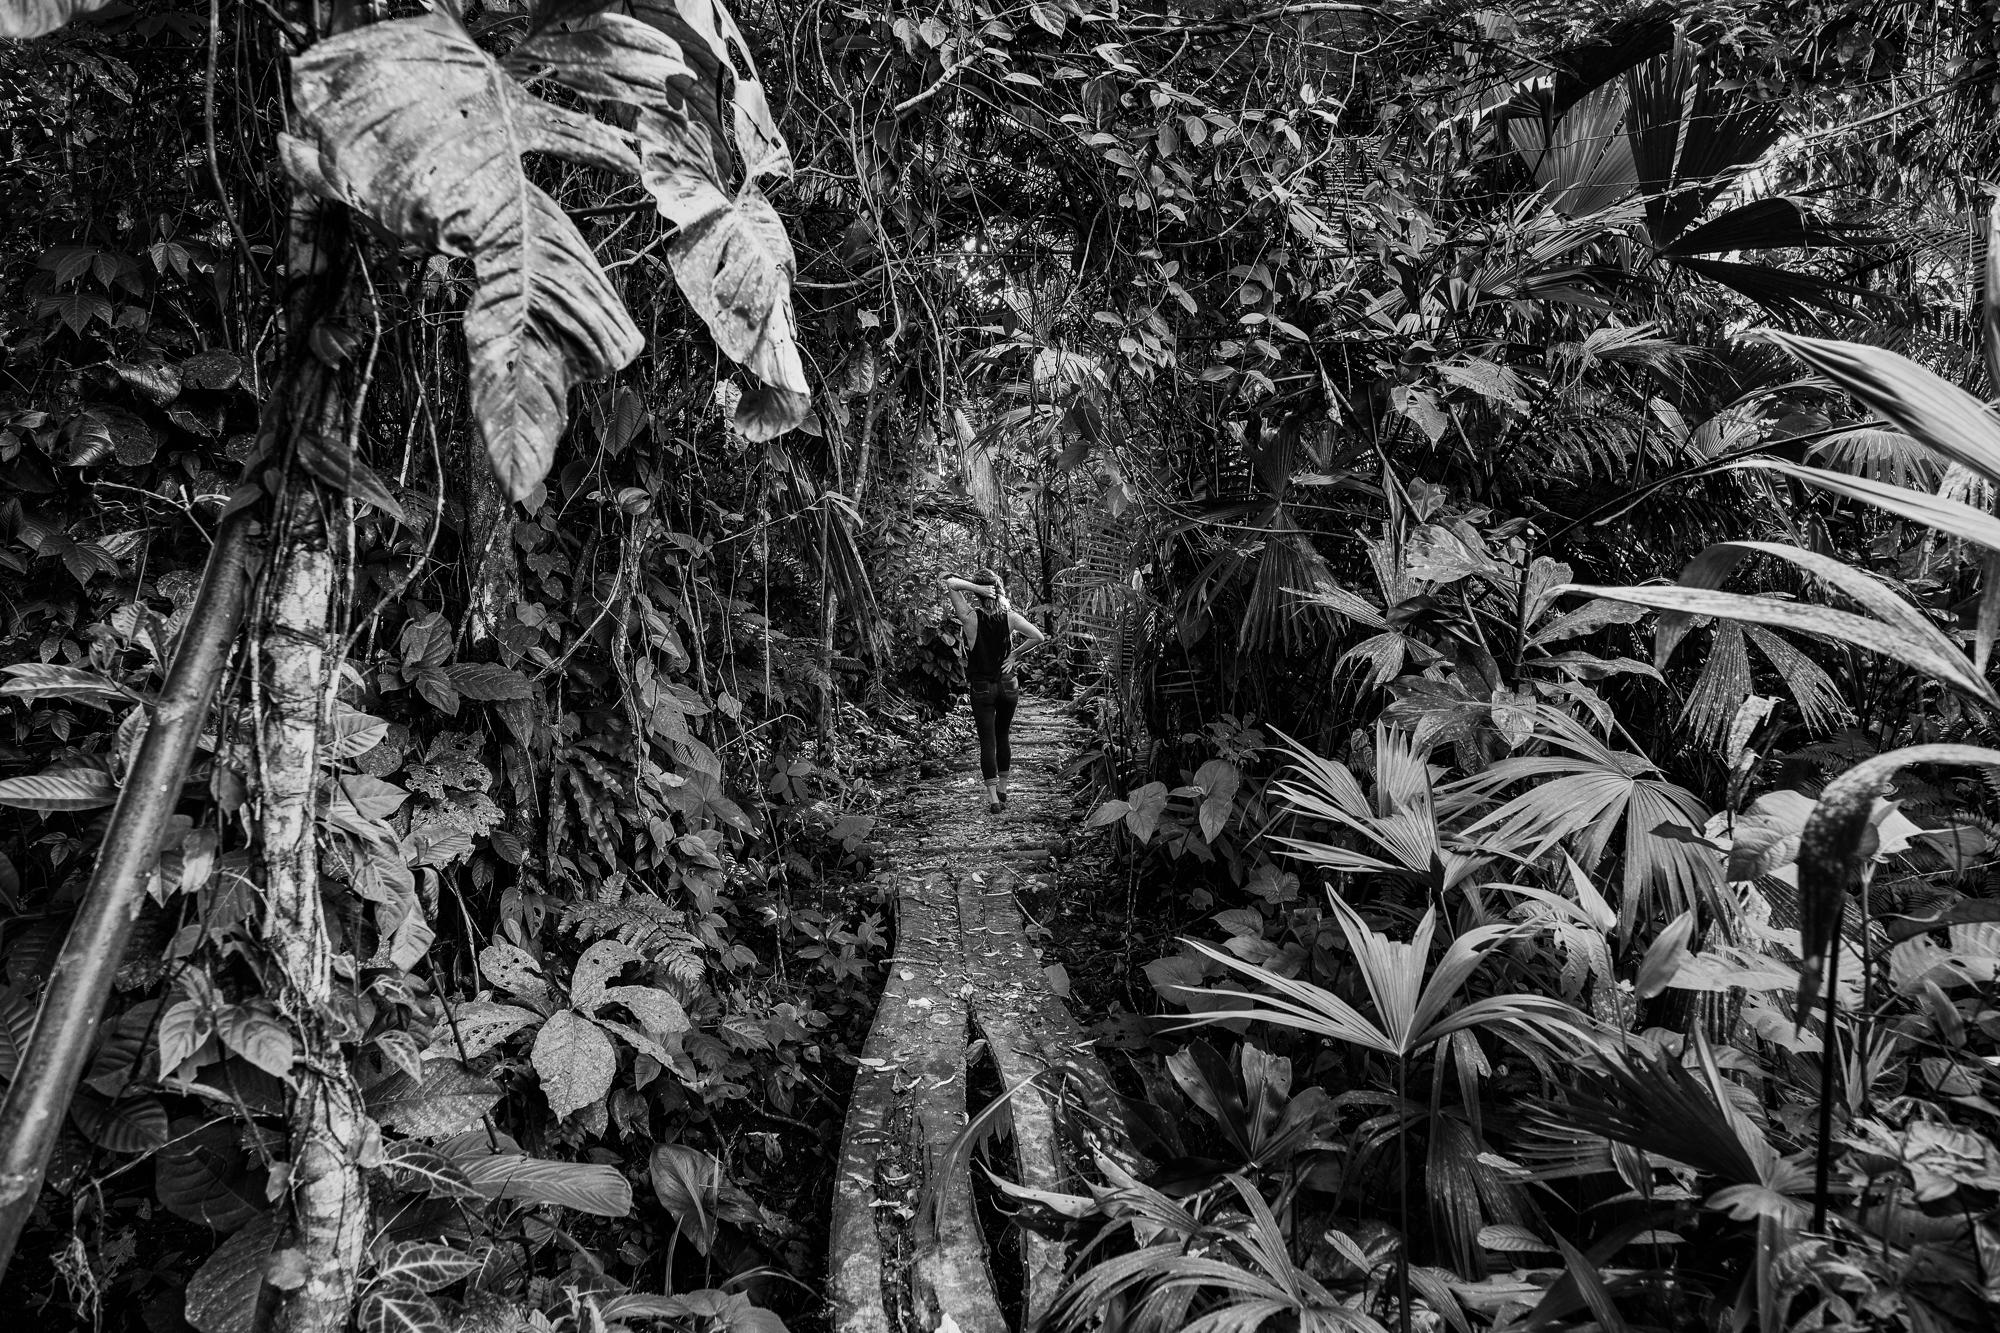 20170210-Ariane-Cassidy-Hannah-Amazon-jungle-FUJIFILM-X-Pro2-0088-Edit.jpg